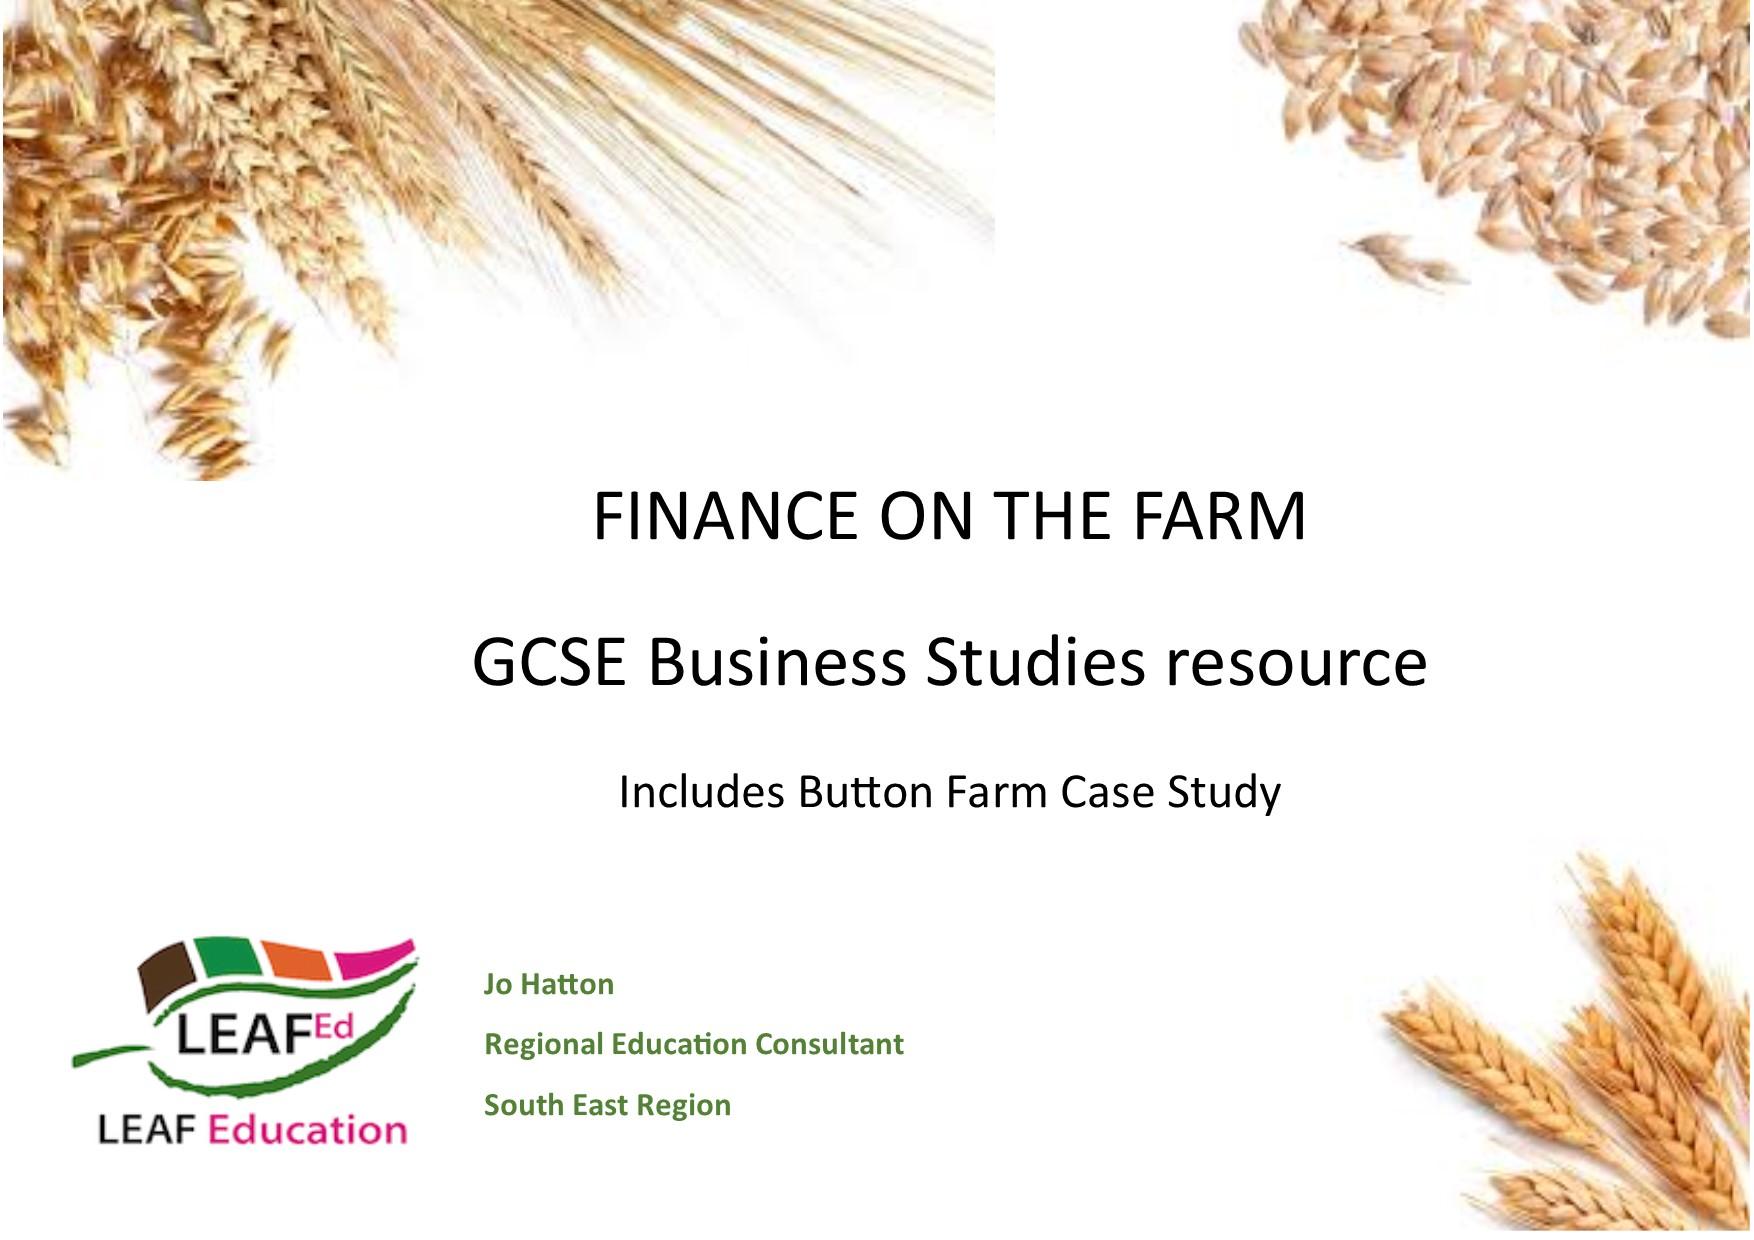 GCSE Business Studies - Finance on the Farm